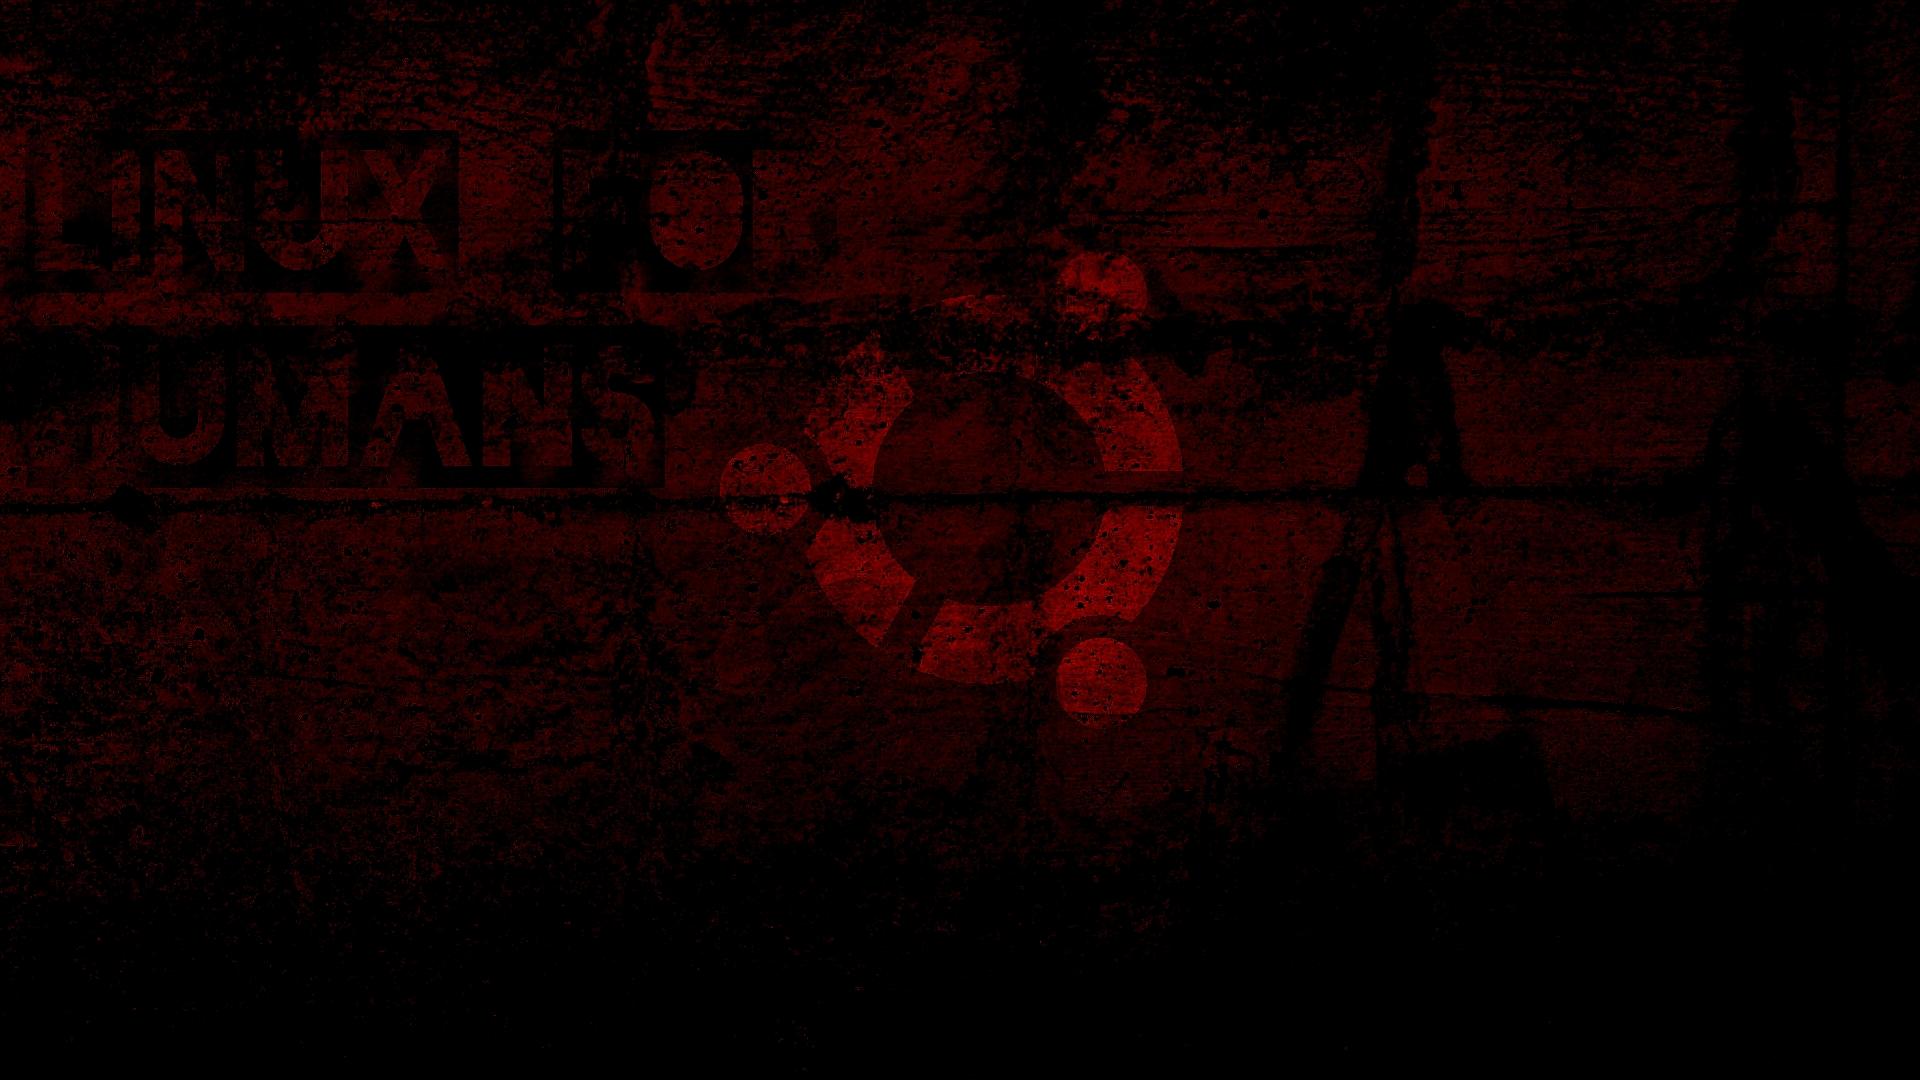 Dark Ubuntu Wallpaper by sev e on deviantART 1920x1080